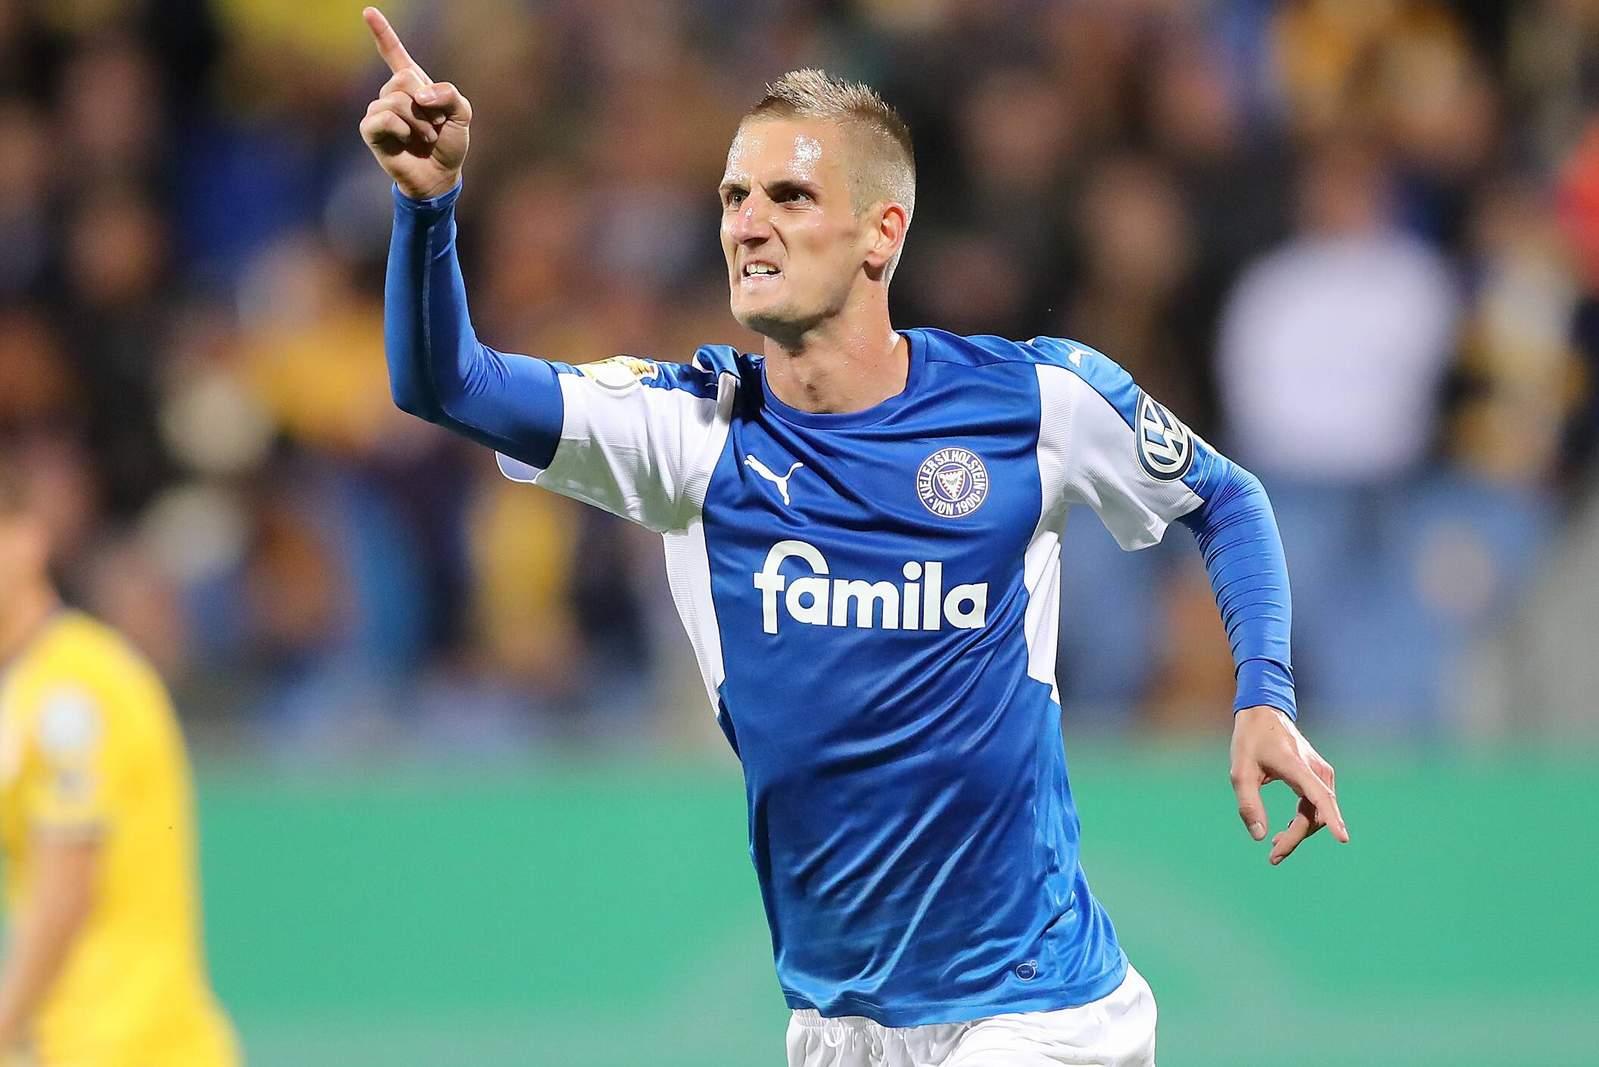 Holstein Kiel Greuther Furth Prognose Tipp 20 08 17 Liga Zwei De